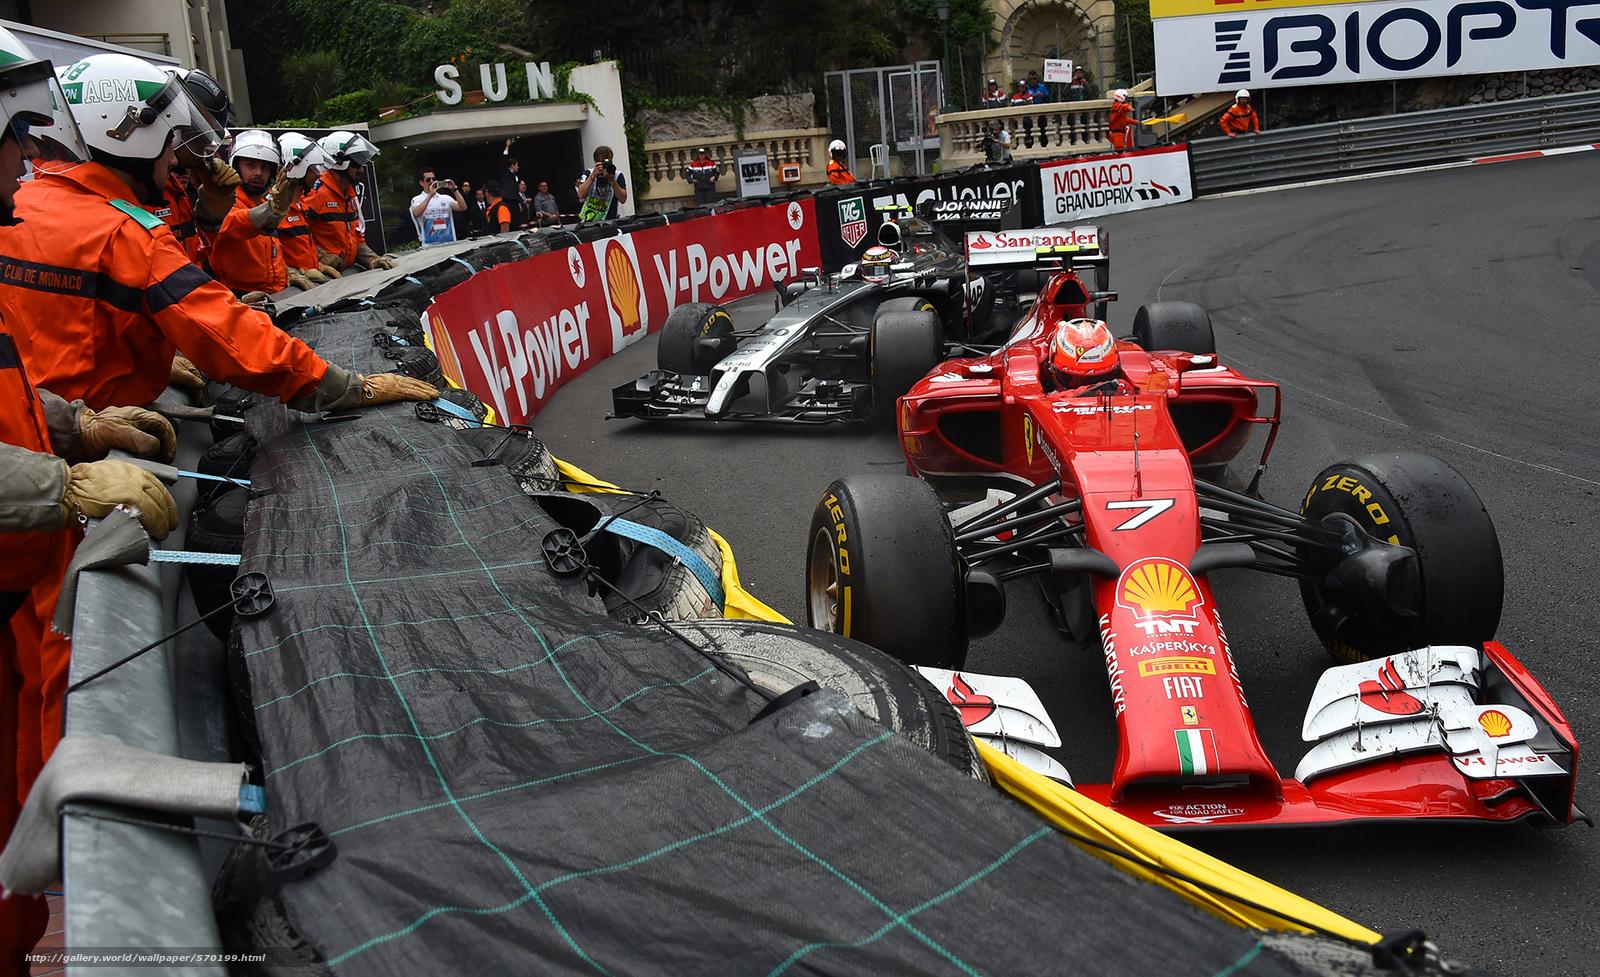 Download wallpaper race,  motorsports,  Monaco free desktop wallpaper in the resolution 1920x1172 — picture №570199